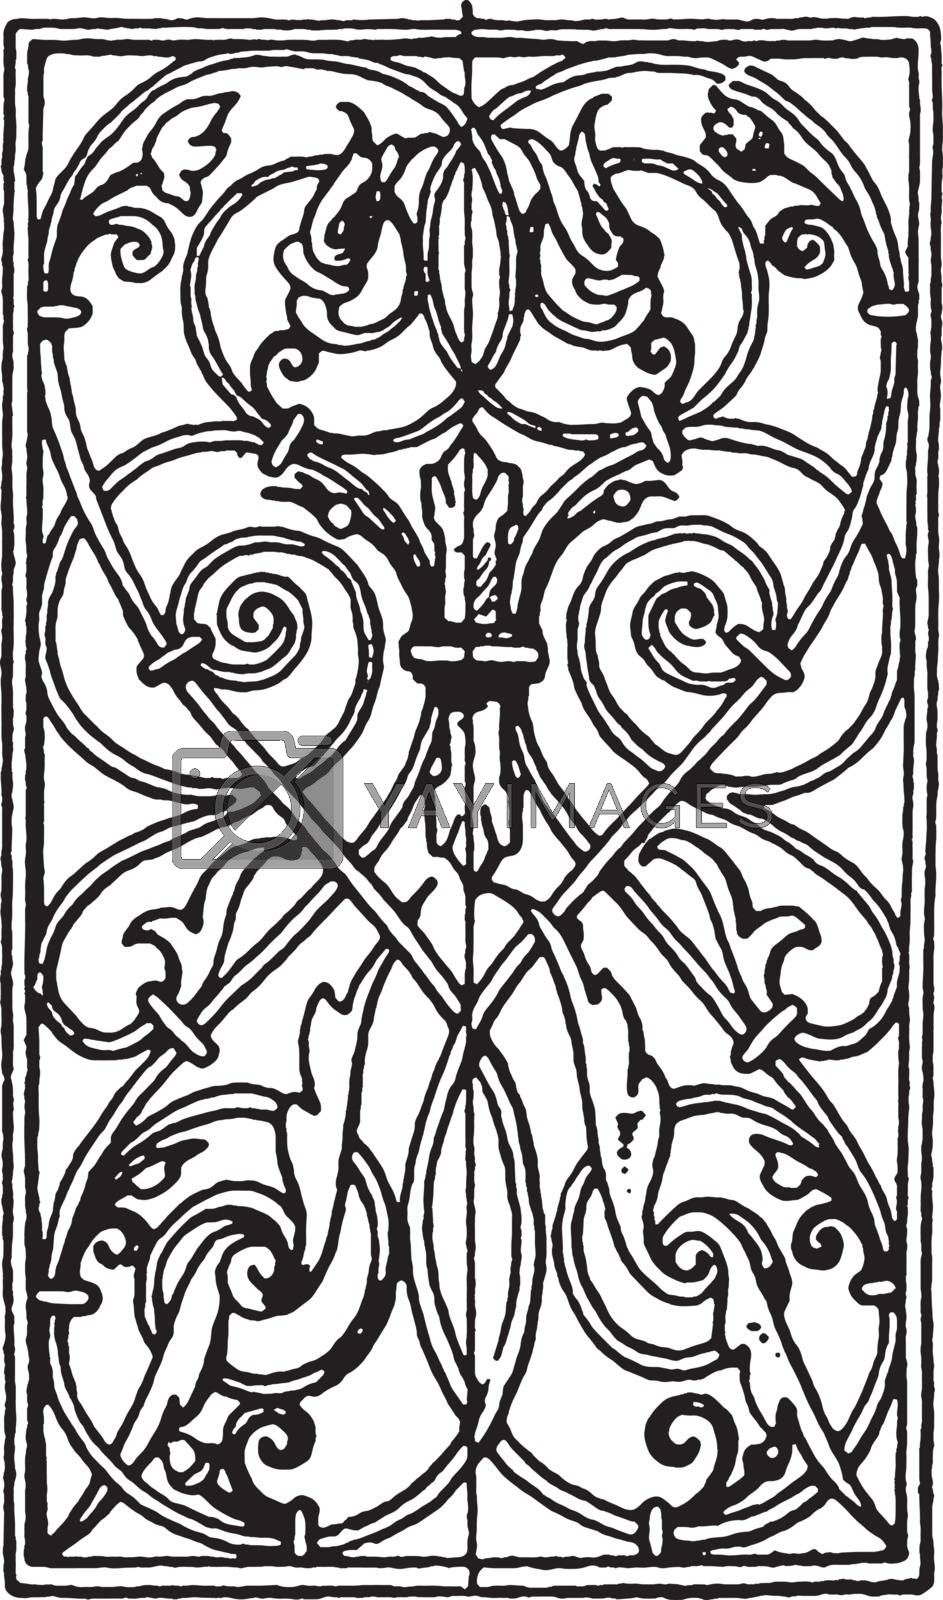 Wrought-Iron Oblong Panel is German Renaissance design, vintage  by Morphart